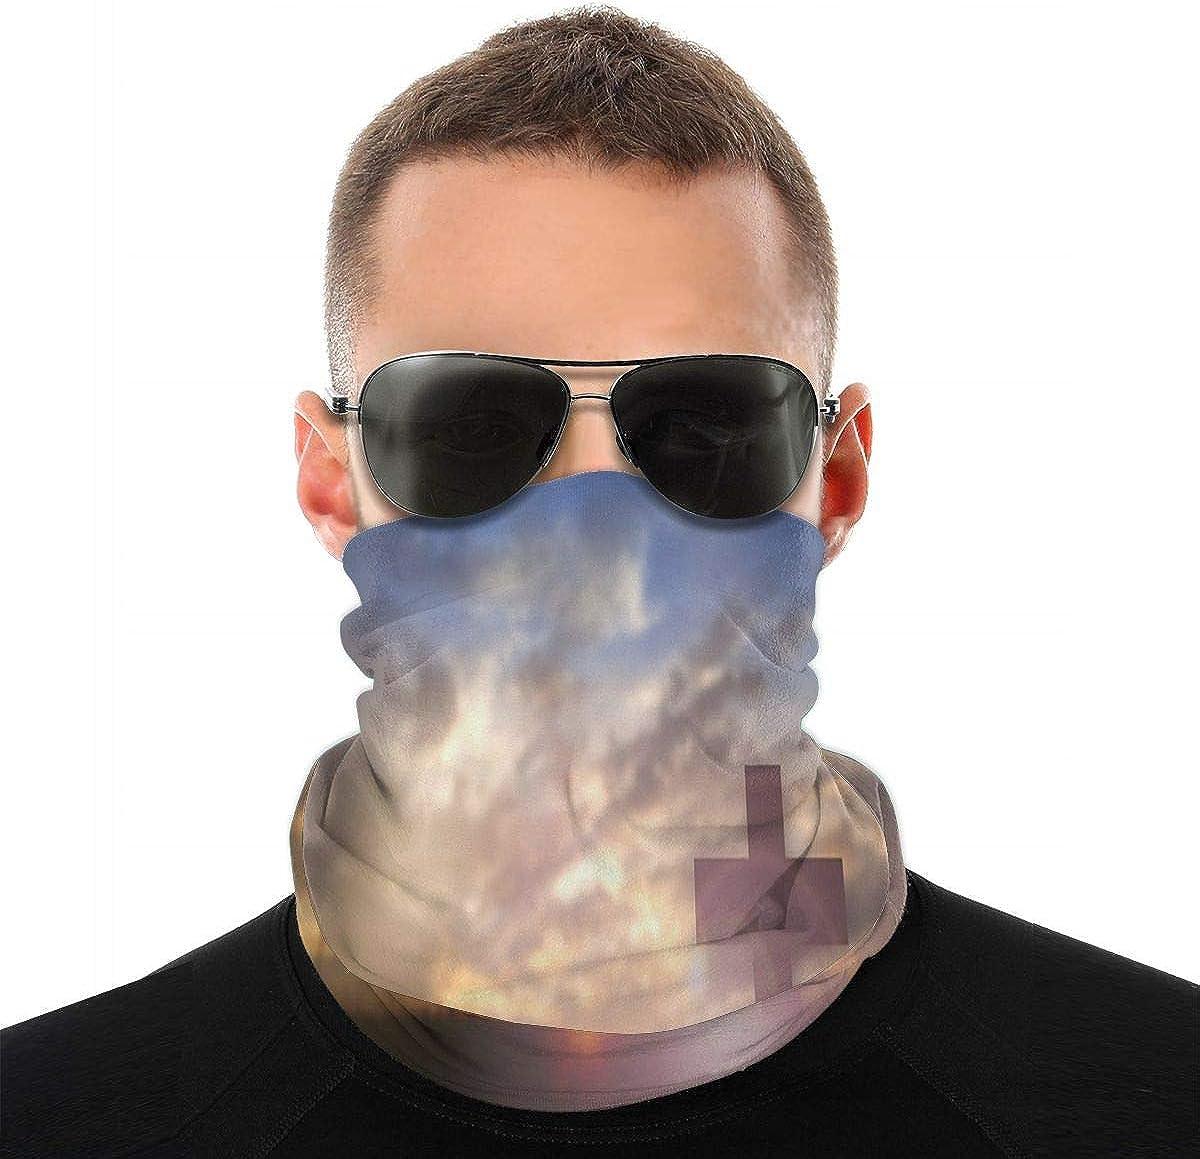 KiuLoam Vintage Christian Praise Easter Seamless Face Mask Bandanas Neck Gaiter for Men and Women, Multifunction Headband Scarf for Dust, Outdoors, Sports